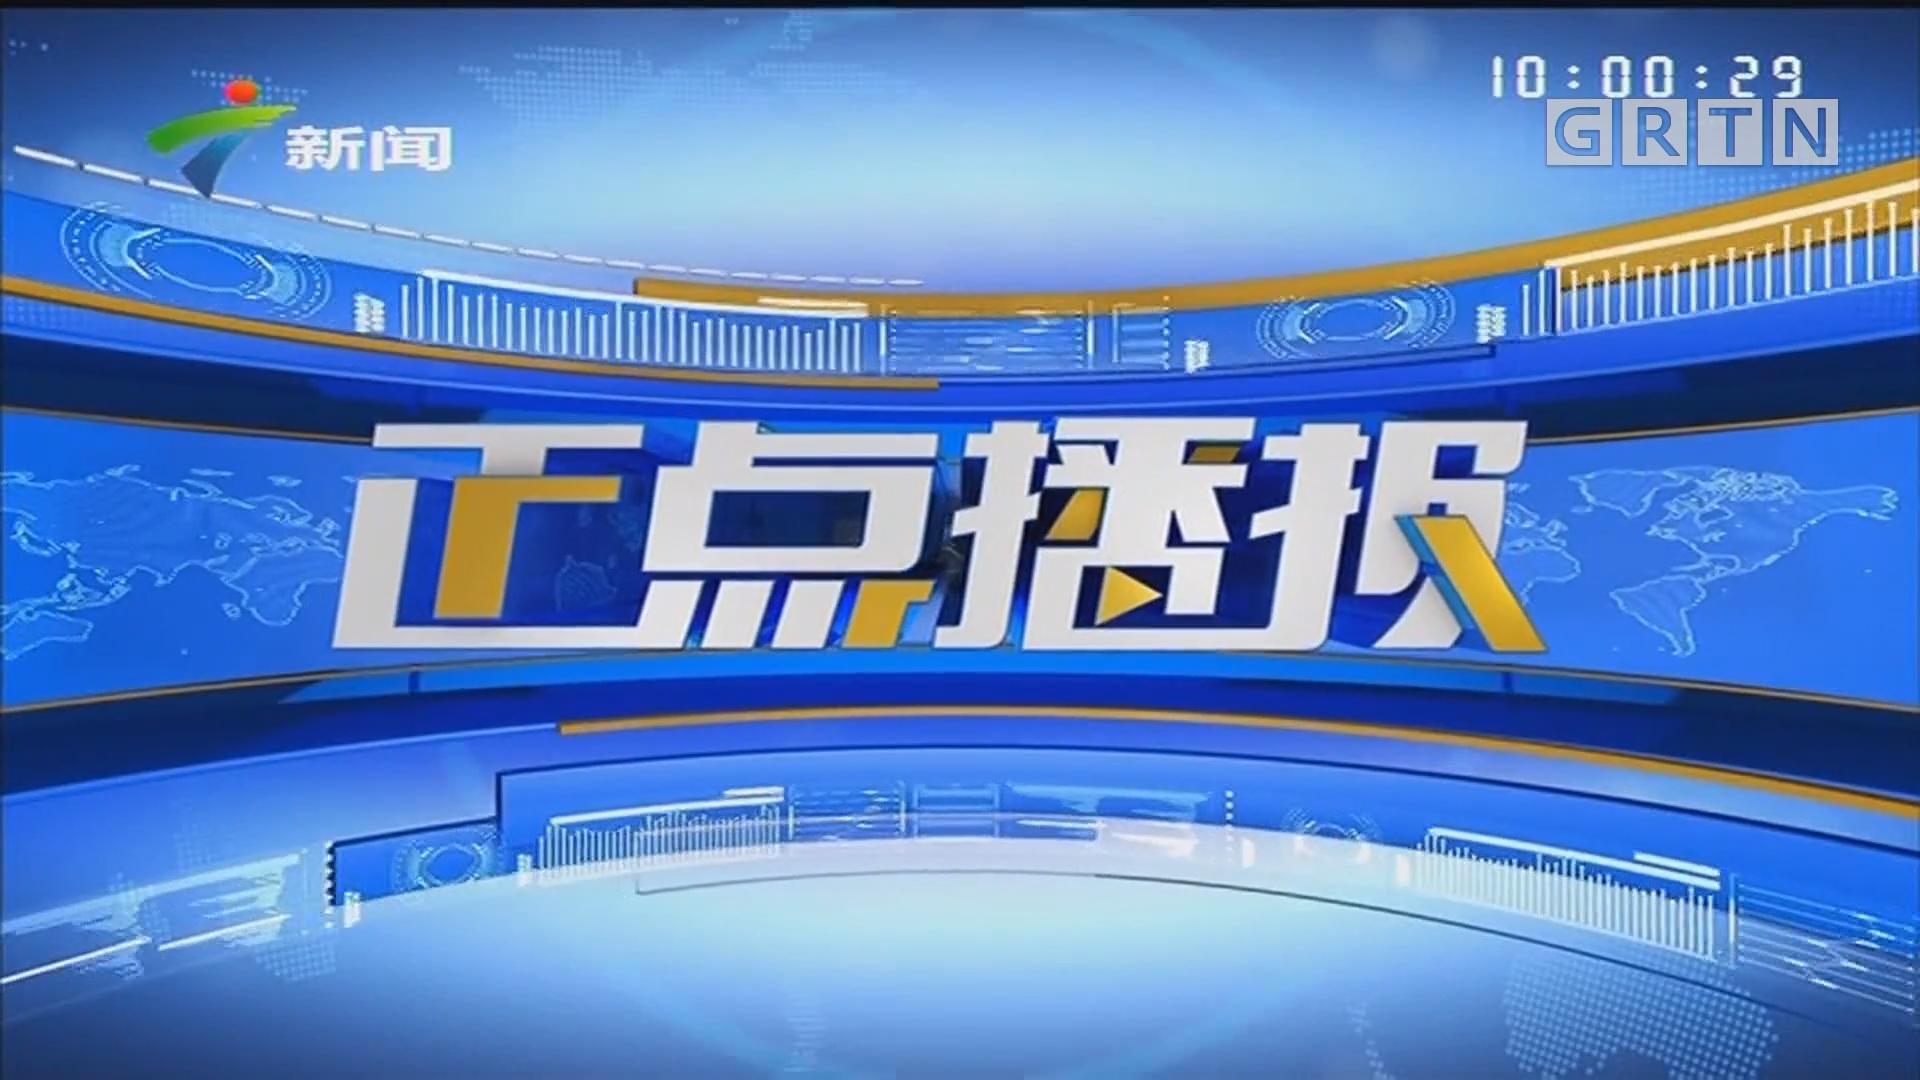 [HD][2019-09-21]正点播报:广东天气:未来三天晴朗干燥 要防范森林火险